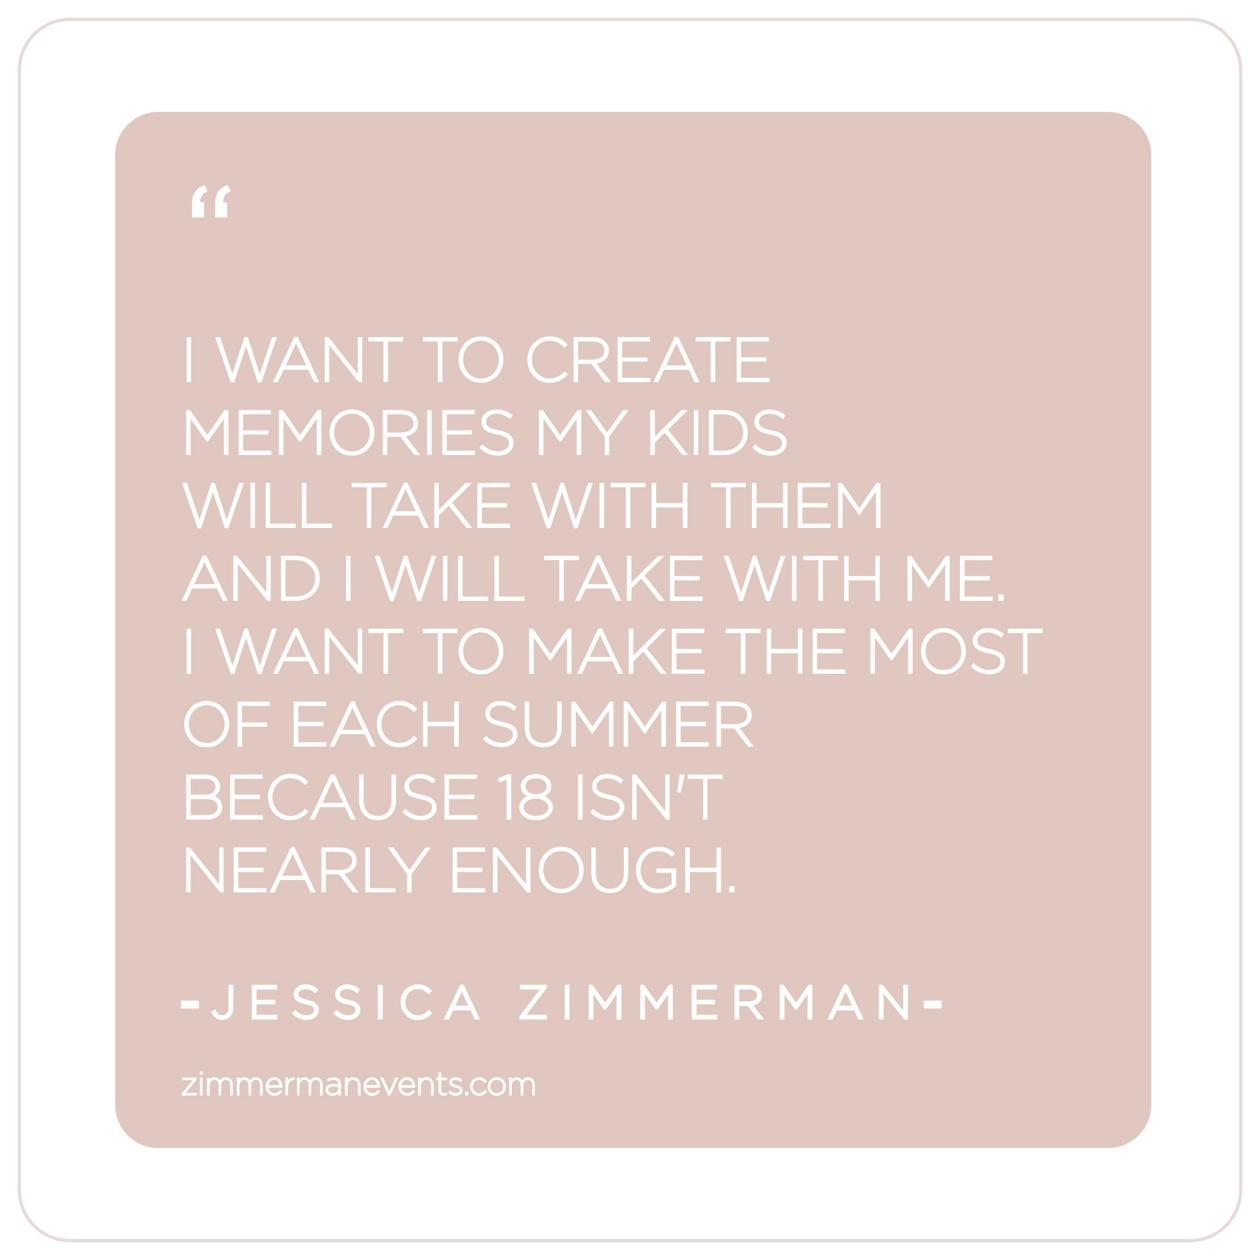 jessica-zimmerman-events-floral-design-coordination-planning-planner-little-rock-conway-arkansas-southern-florist-wedding-home-work-family-balance-business-mentor-balance-work-family-life